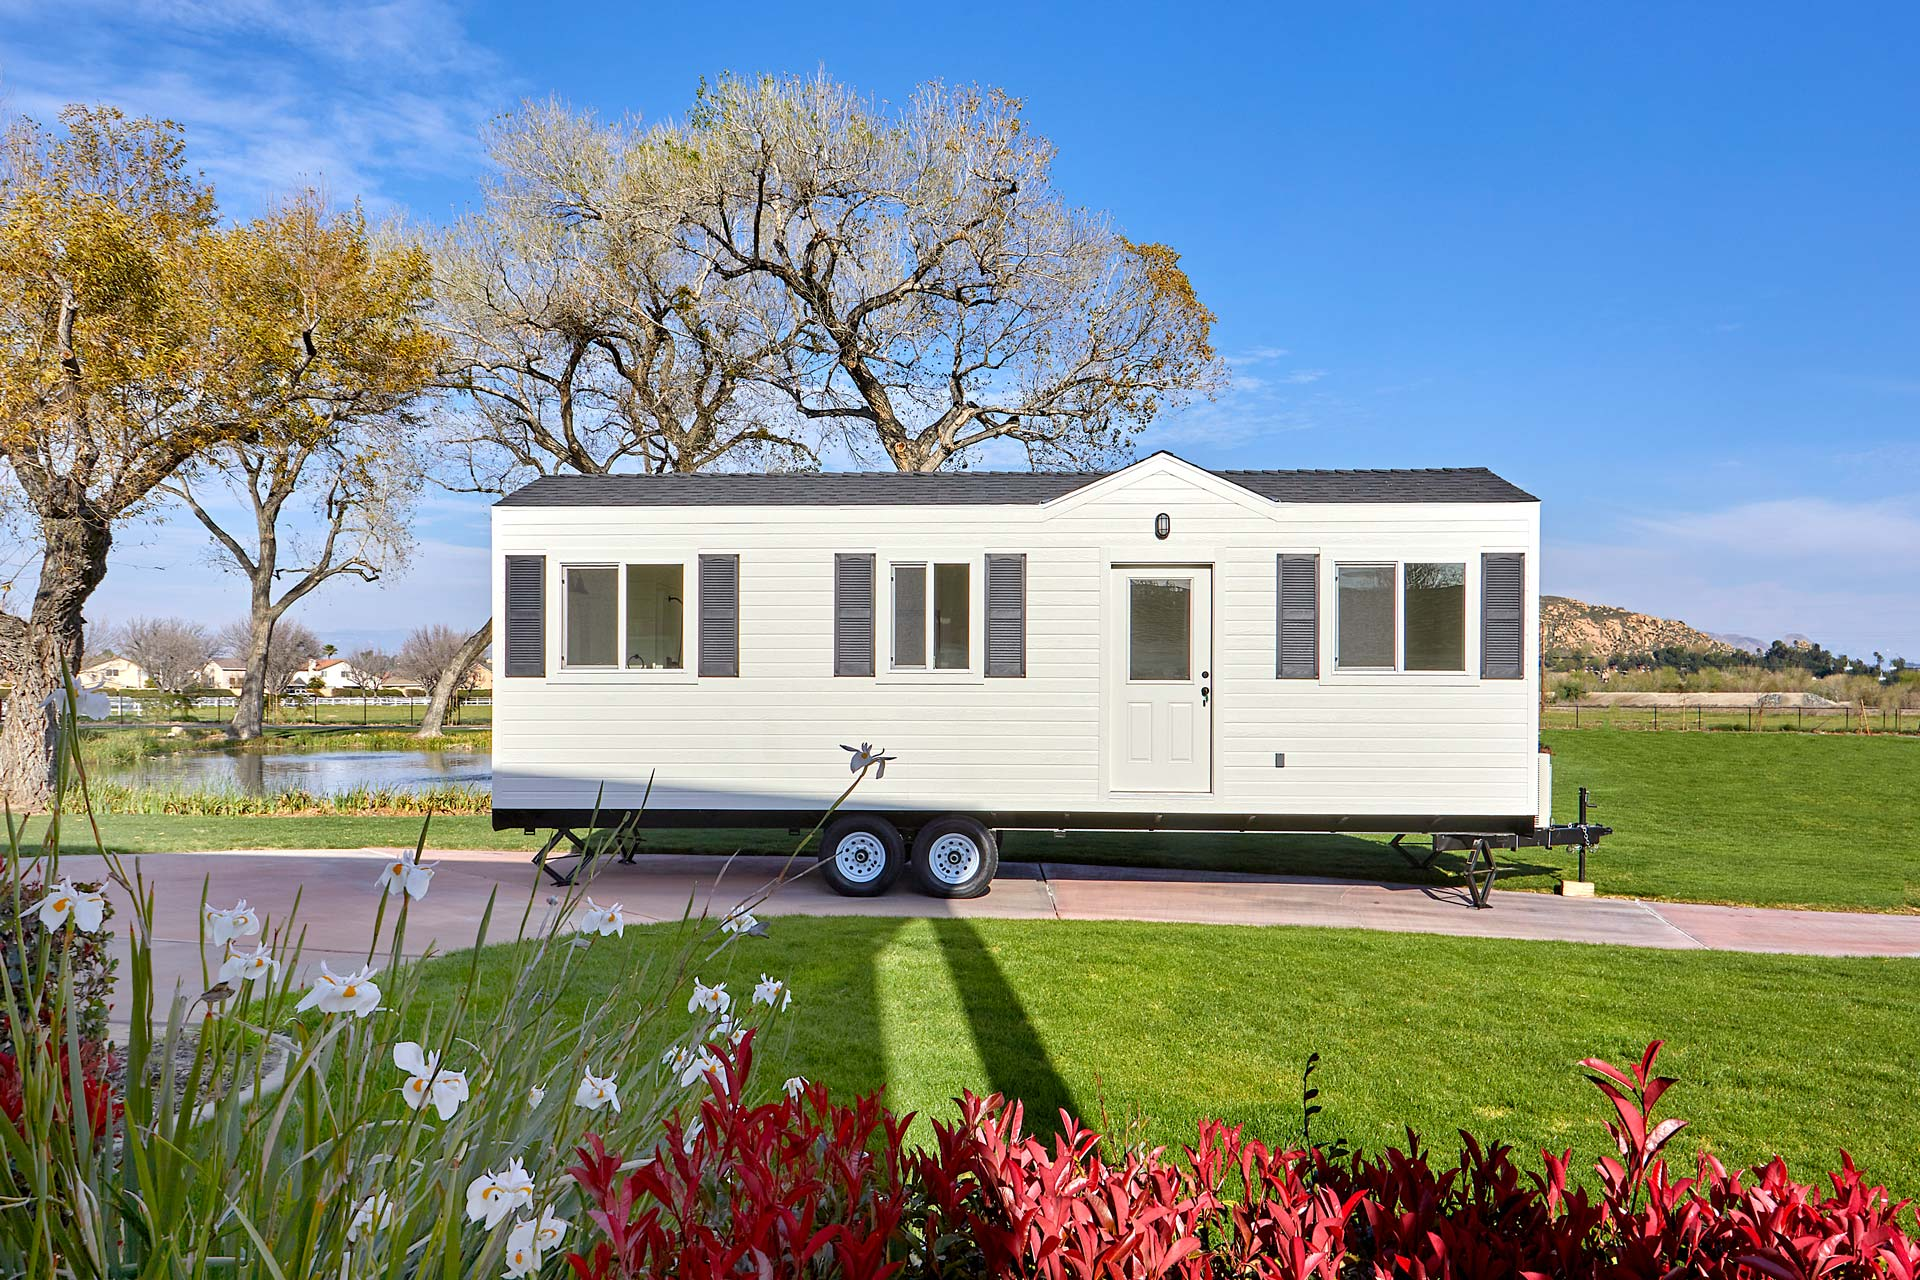 30 Foot Model Tiny Home